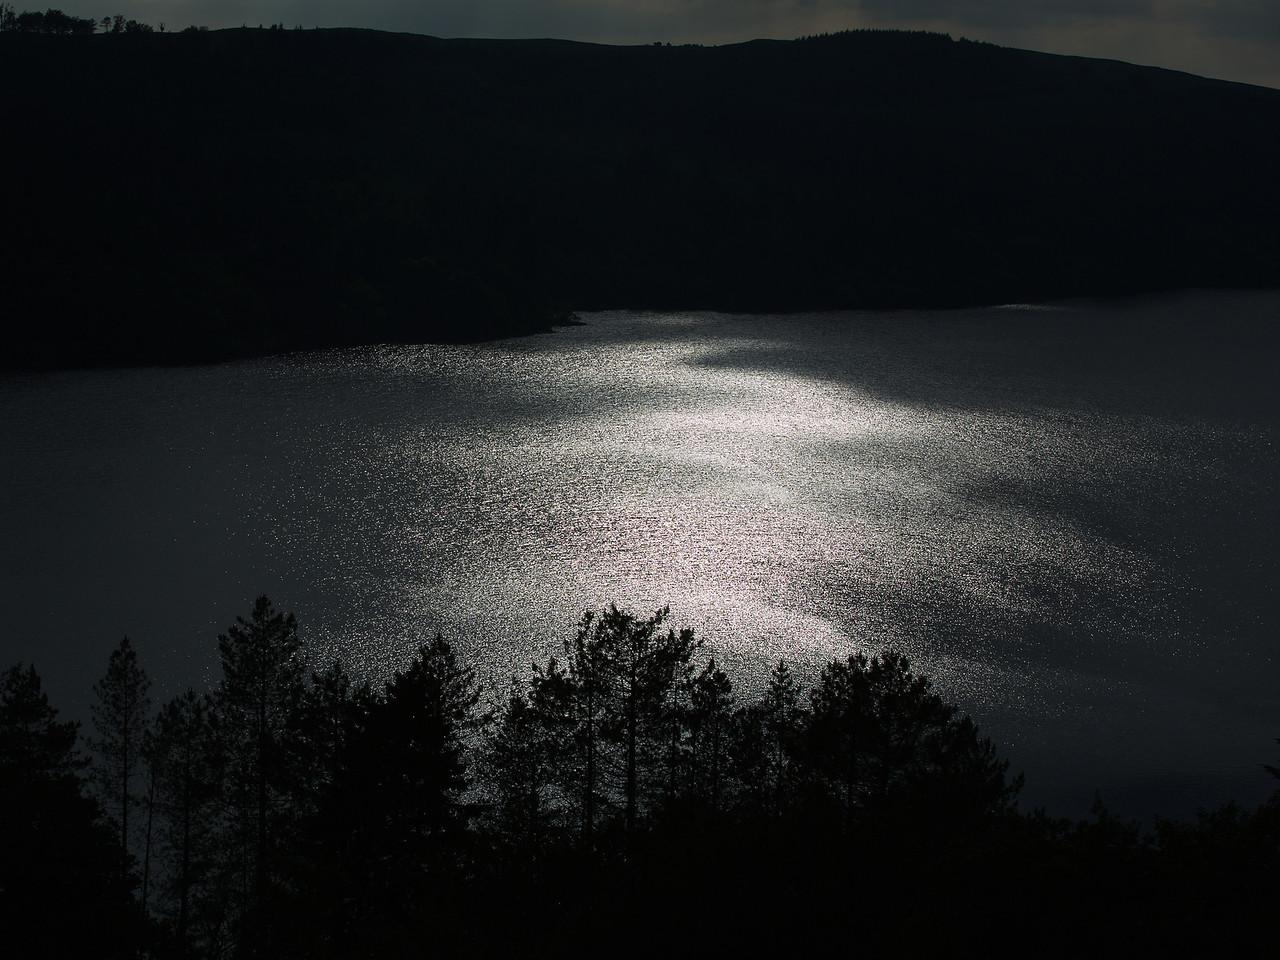 lake vyrnwy 2013-07-20 at 17-17-50